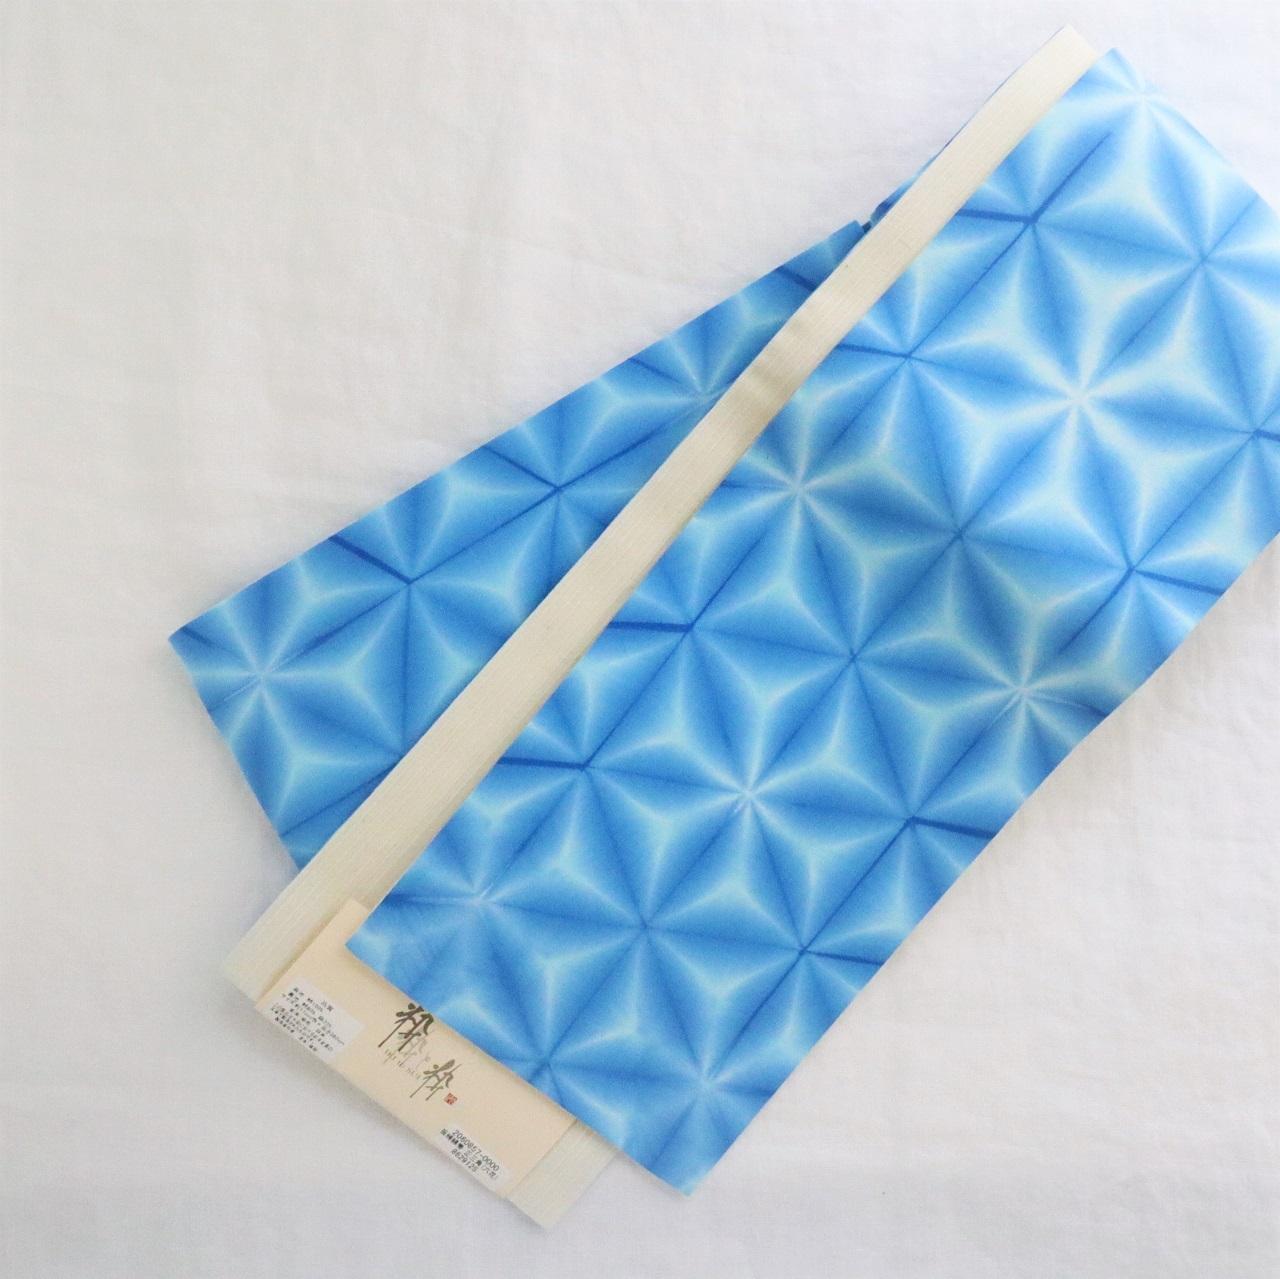 【半巾帯】綿と麻 六花板締め絞り 水色